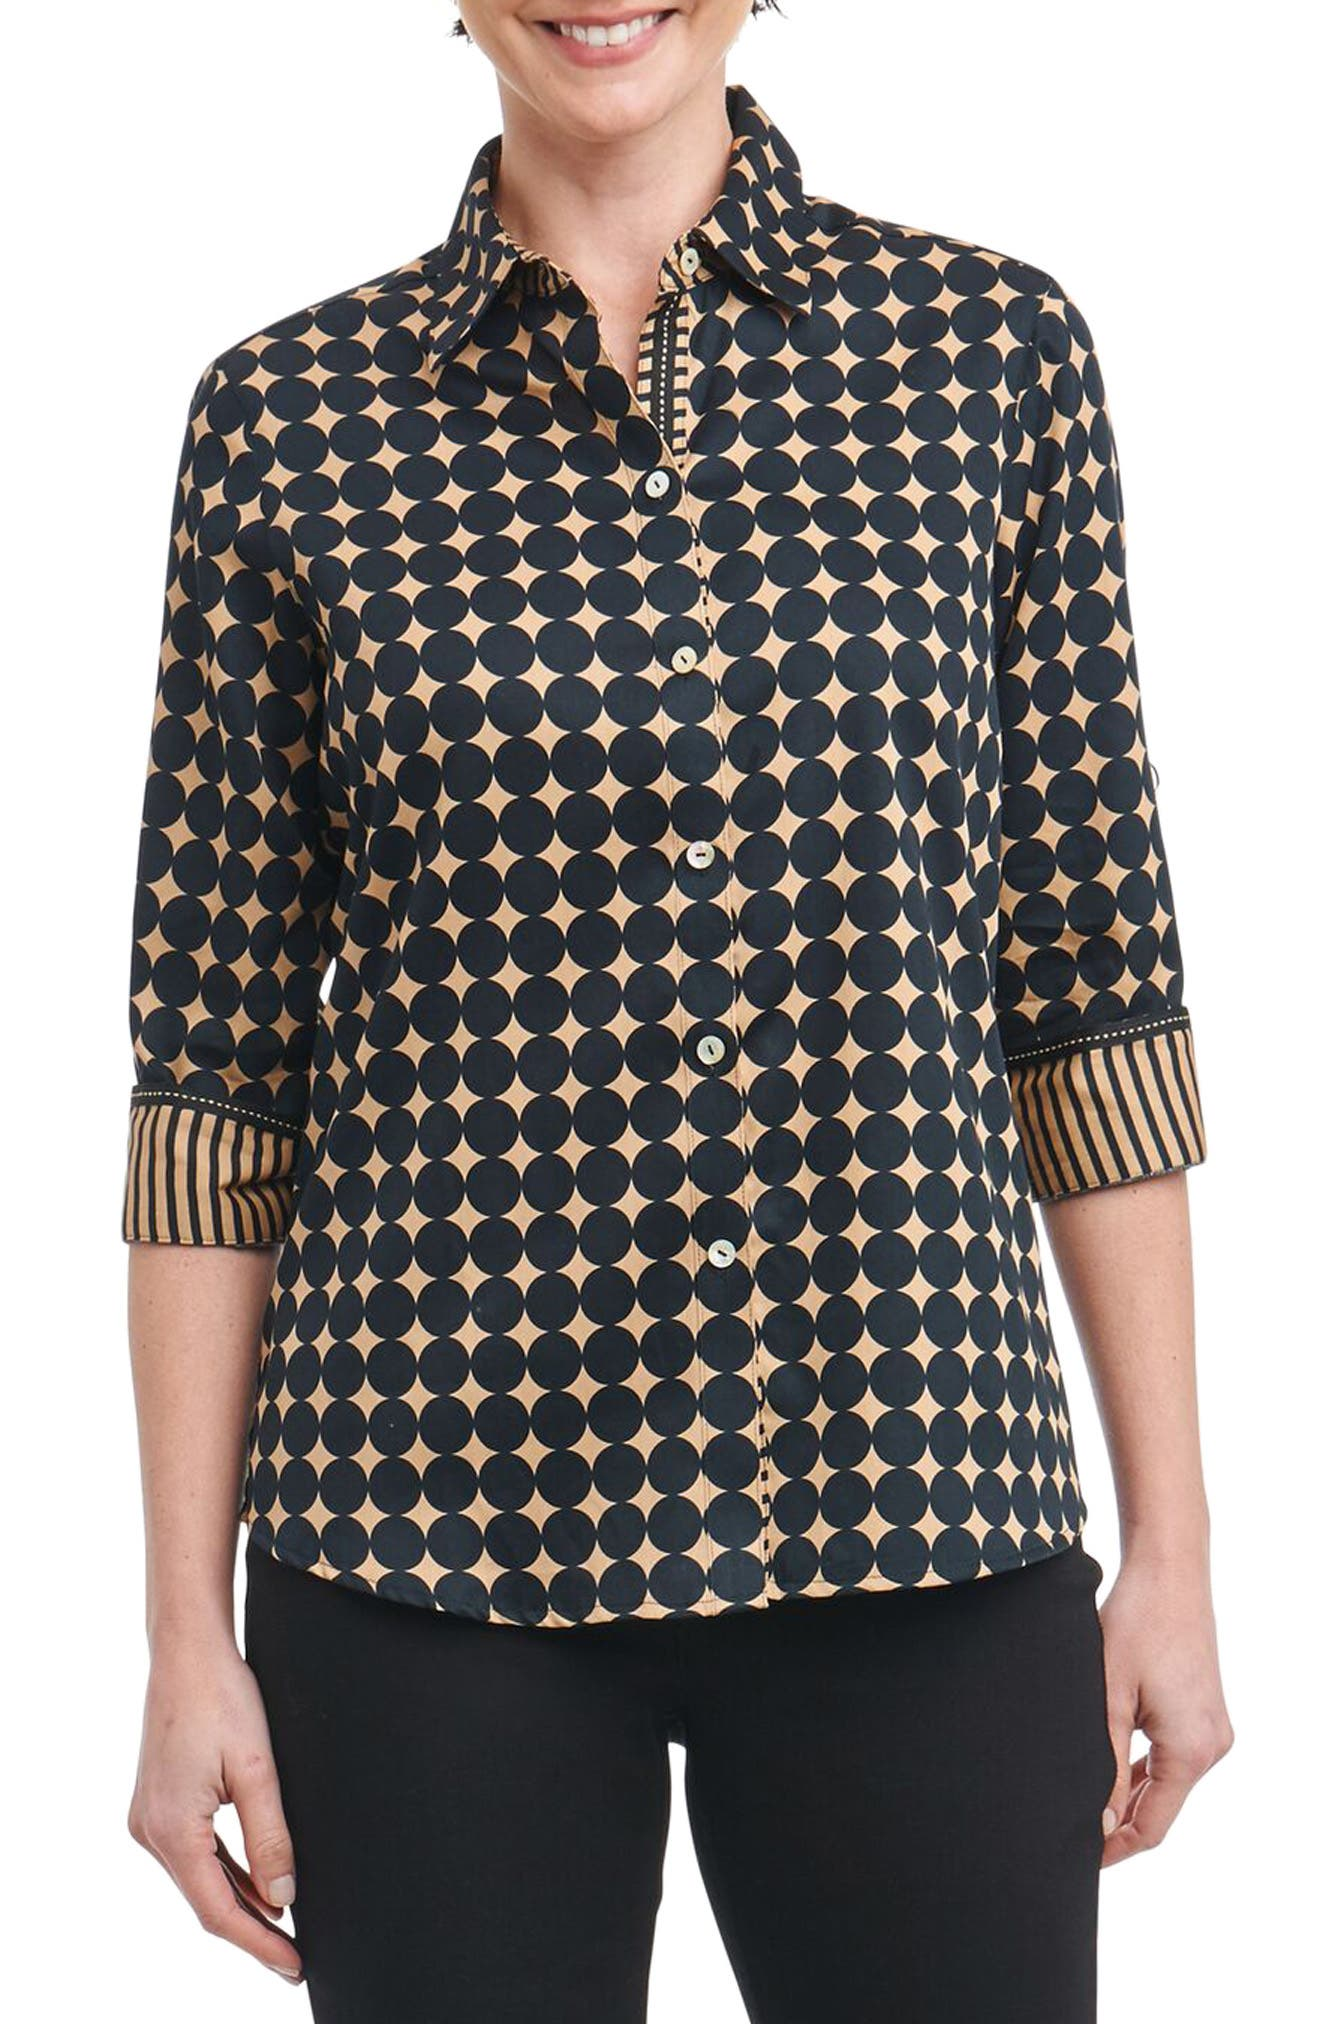 Ava Non-Iron Dot Print Cotton Shirt,                             Main thumbnail 1, color,                             013